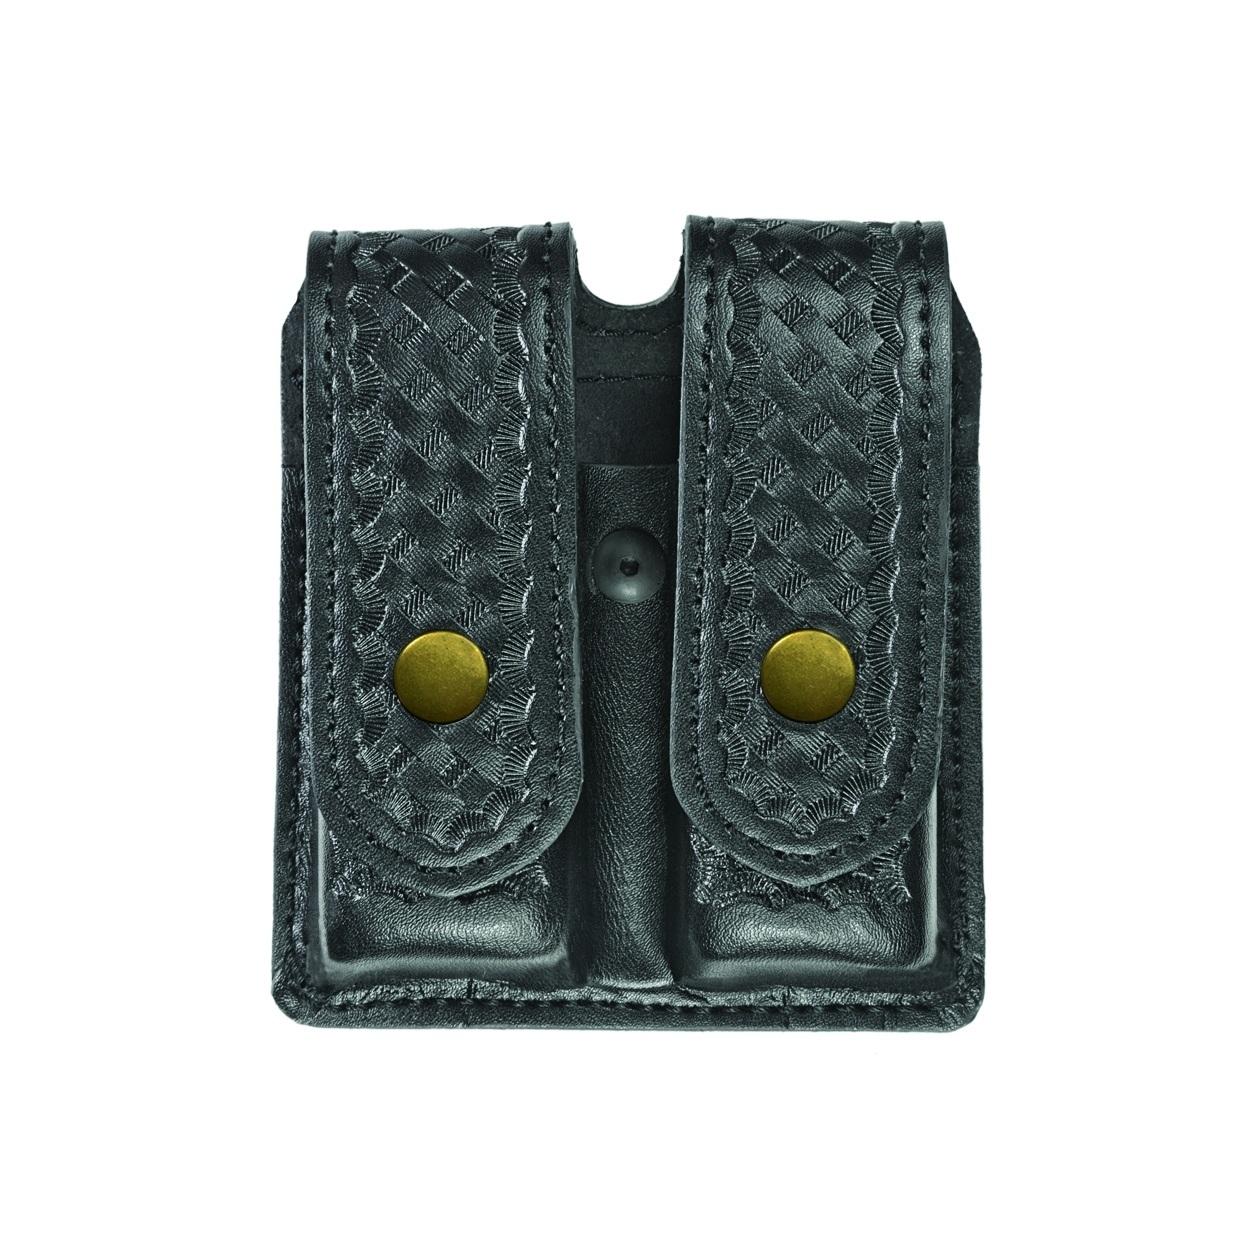 Double Magazine Case, Large, AirTek, BW, Brass Snaps-